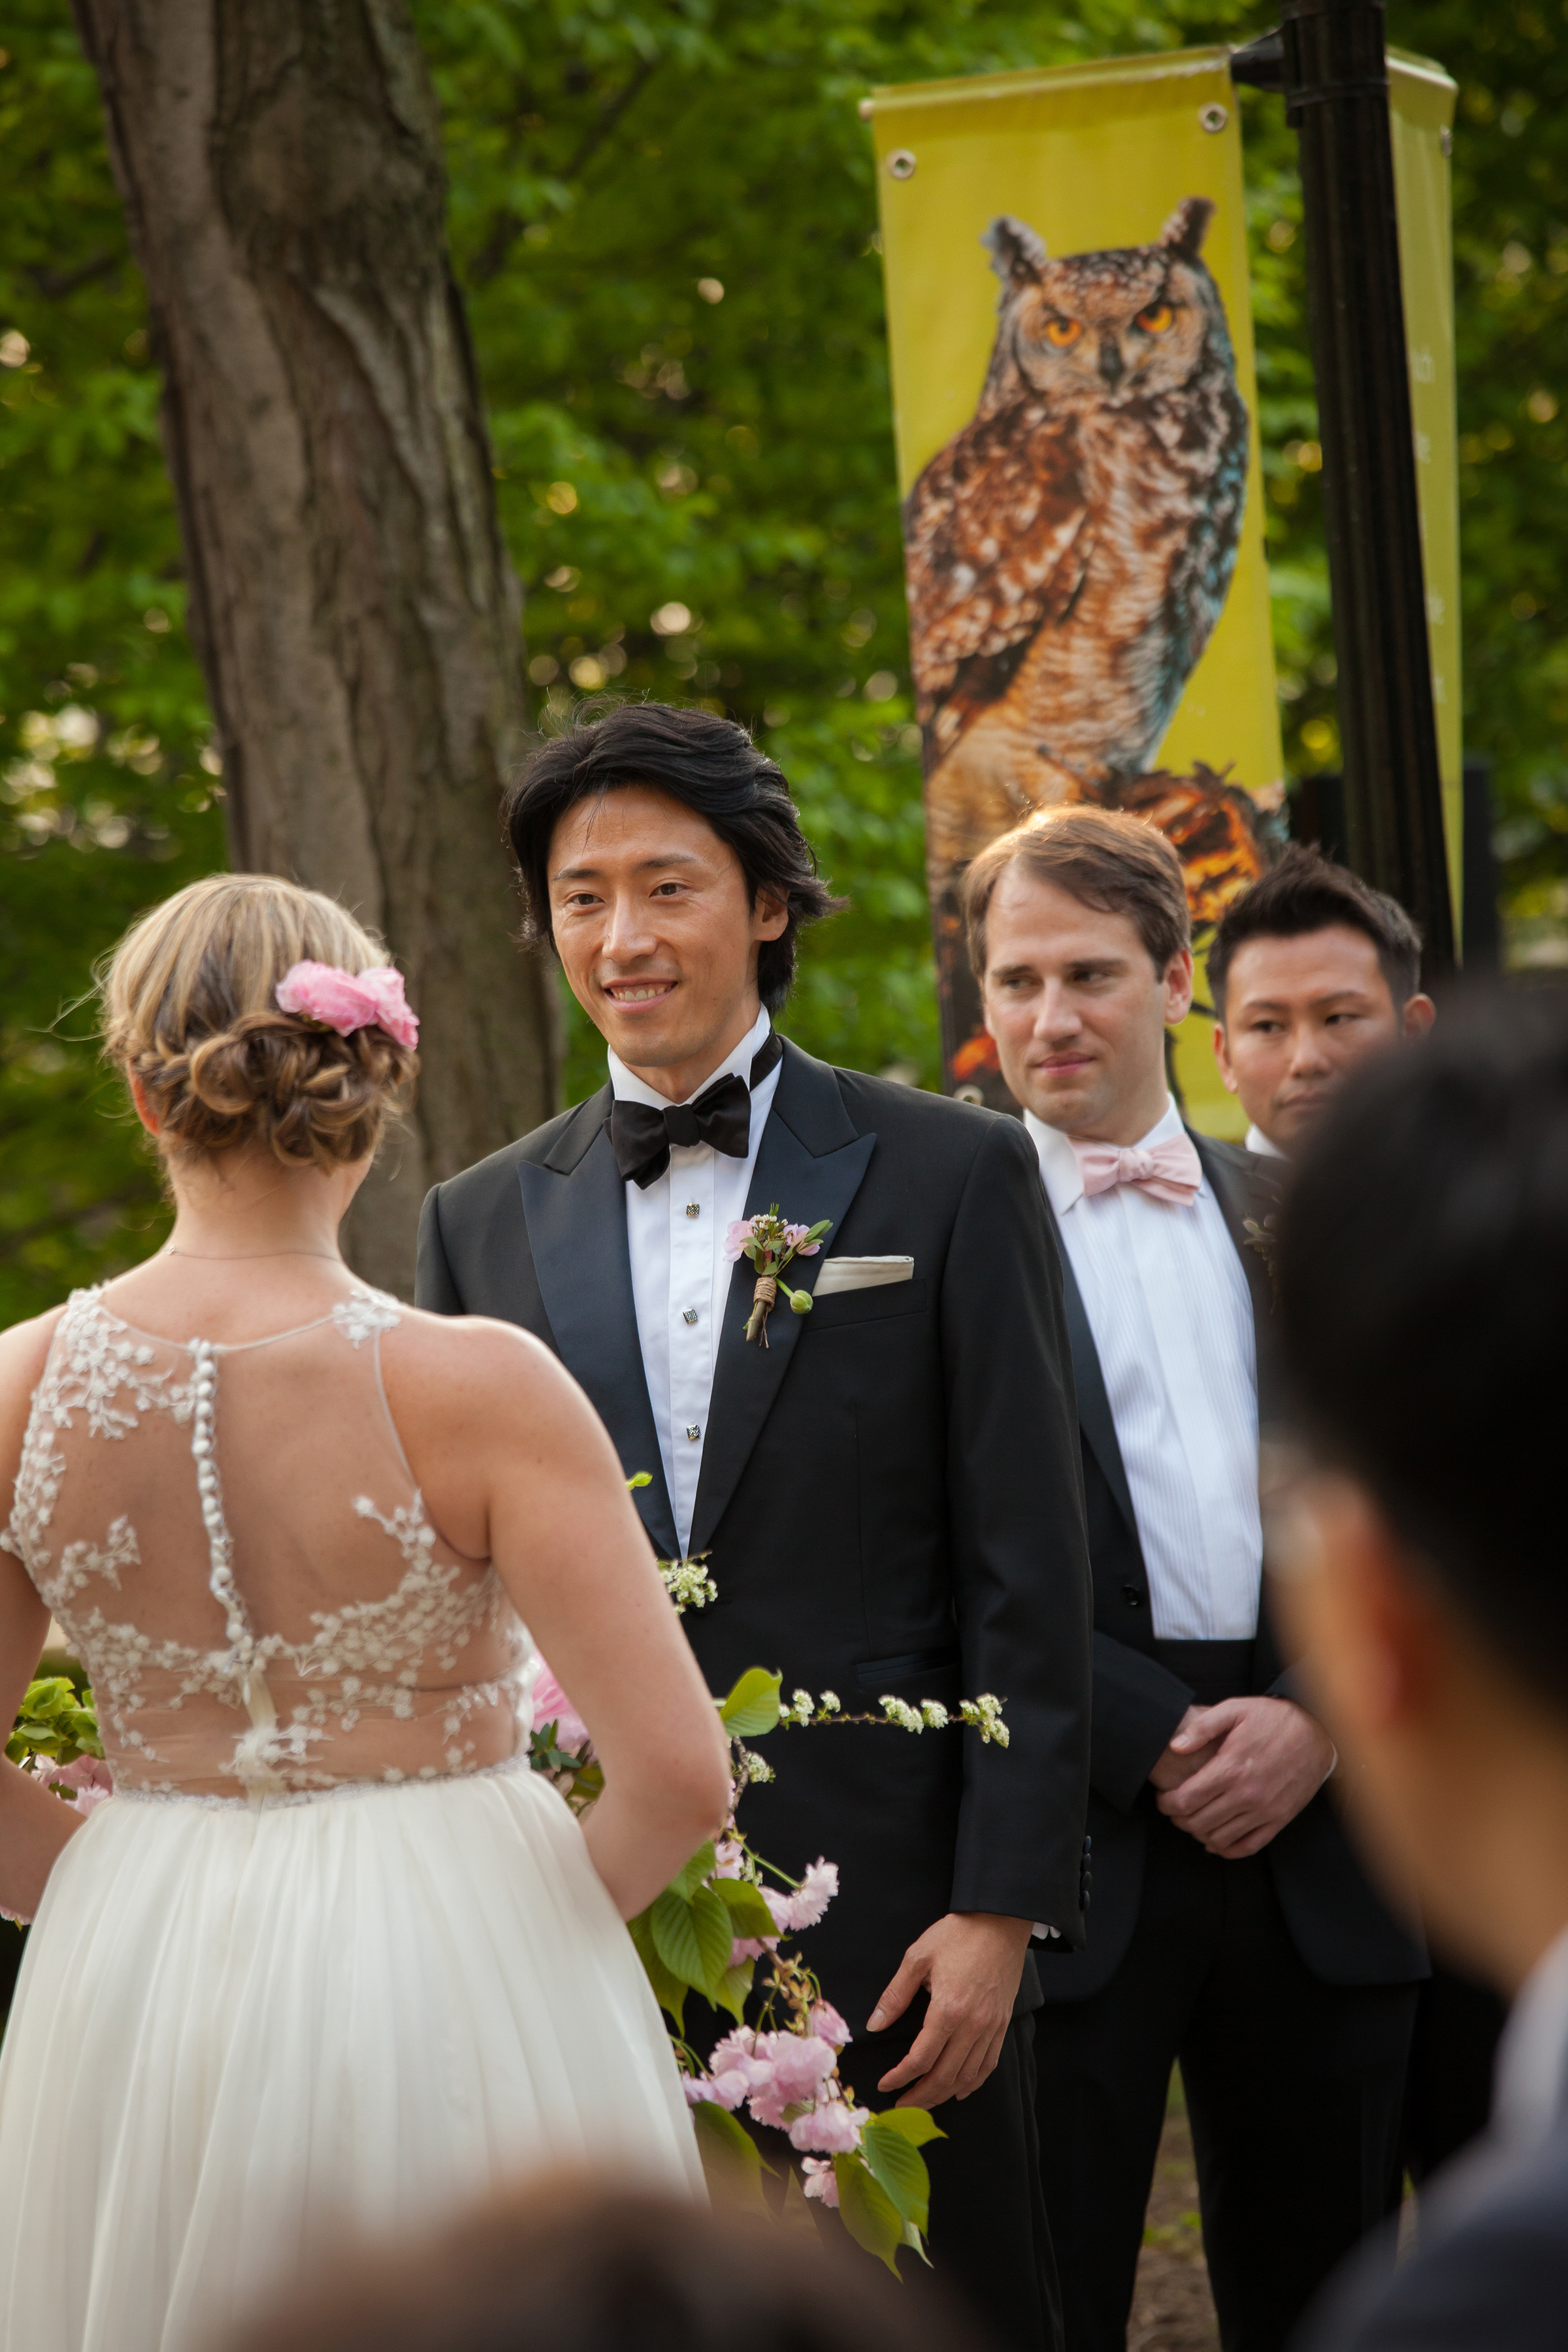 victorious-events-nyc-021-colleen-taka-central-park-zoo-wedding-raymond-hamlin.jpg